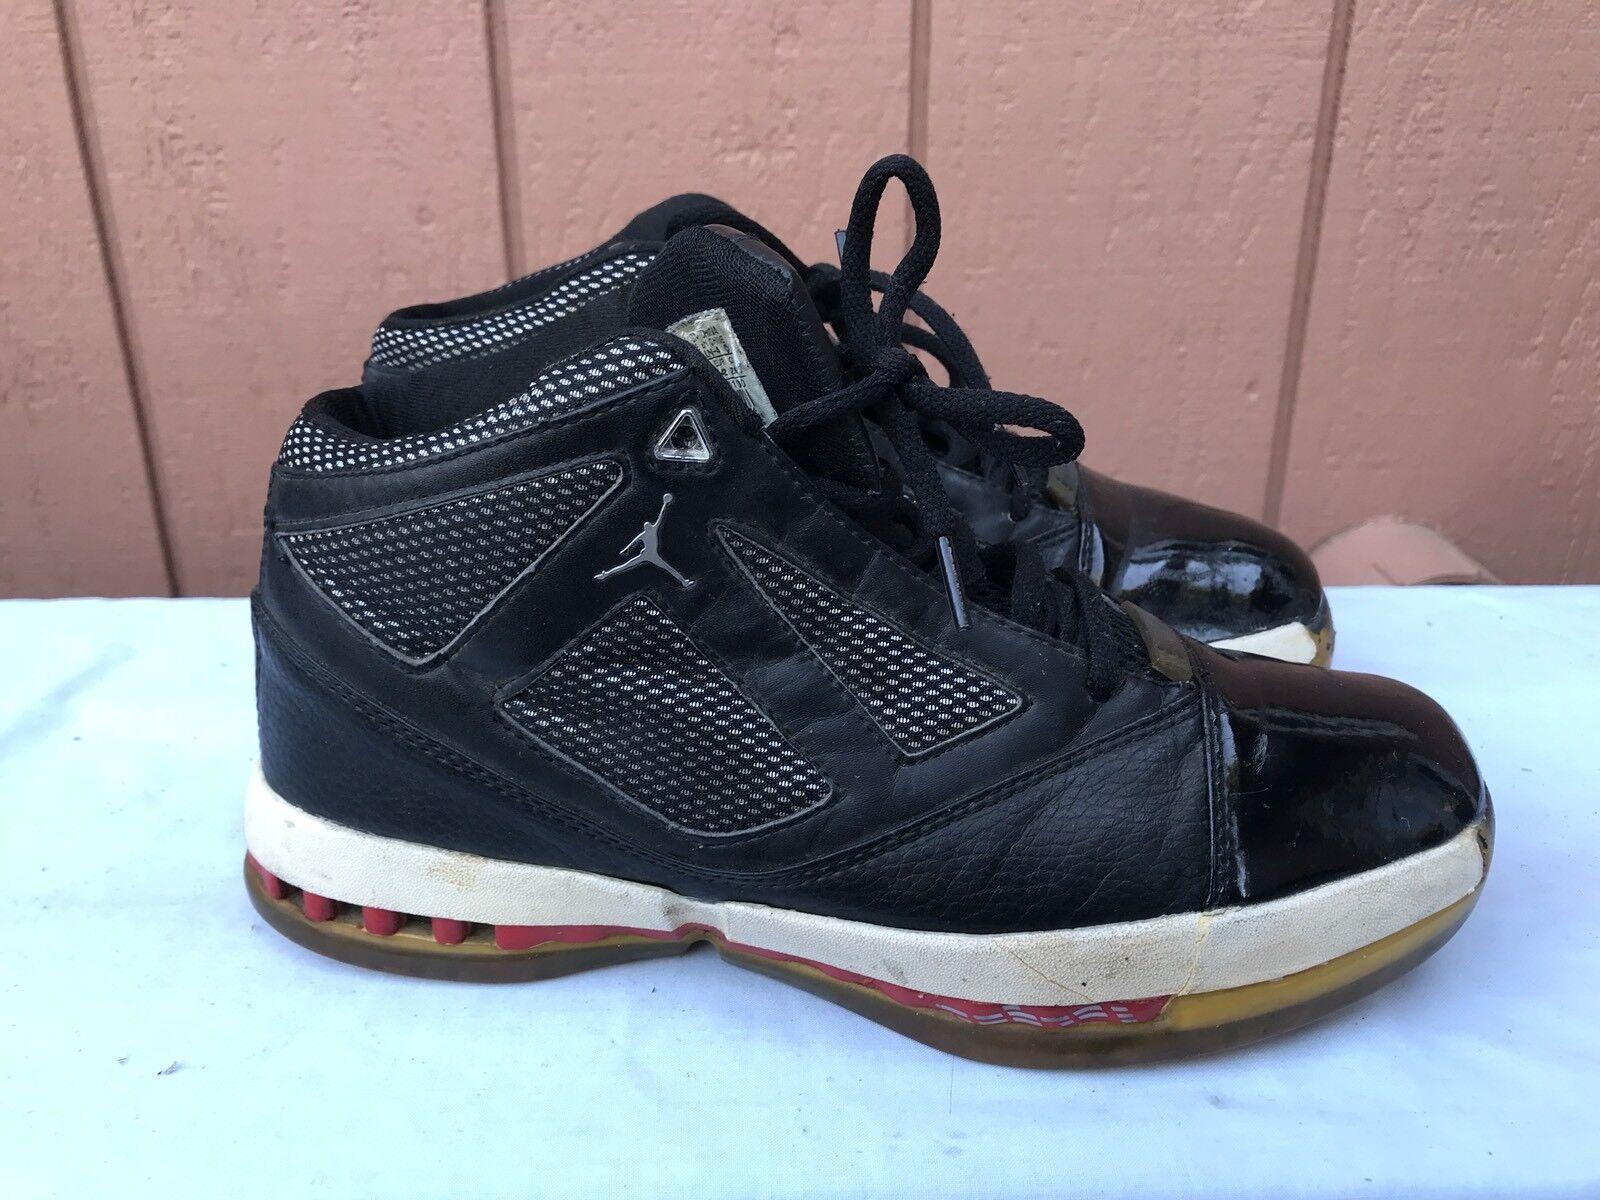 RARE 2018 Nike Air Jordan XVI 16+ OG Basketball Shoes US 8.5 136080 001 A2